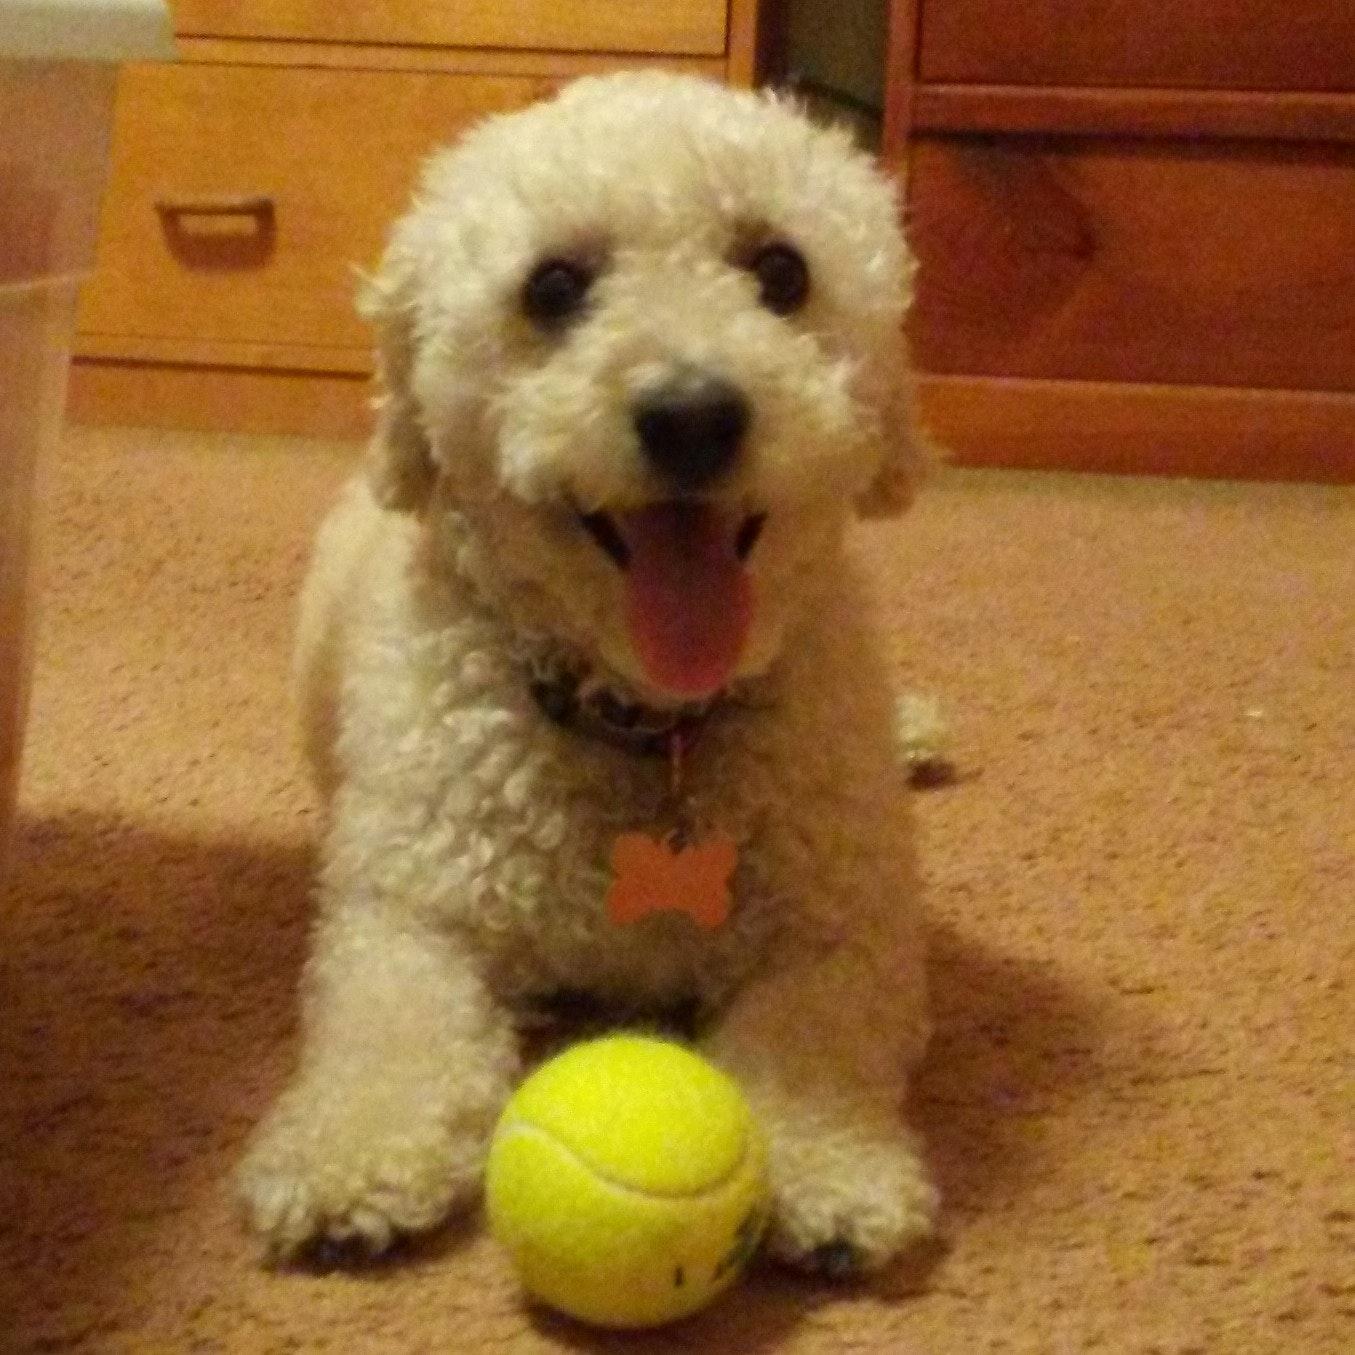 dog walker Lucy